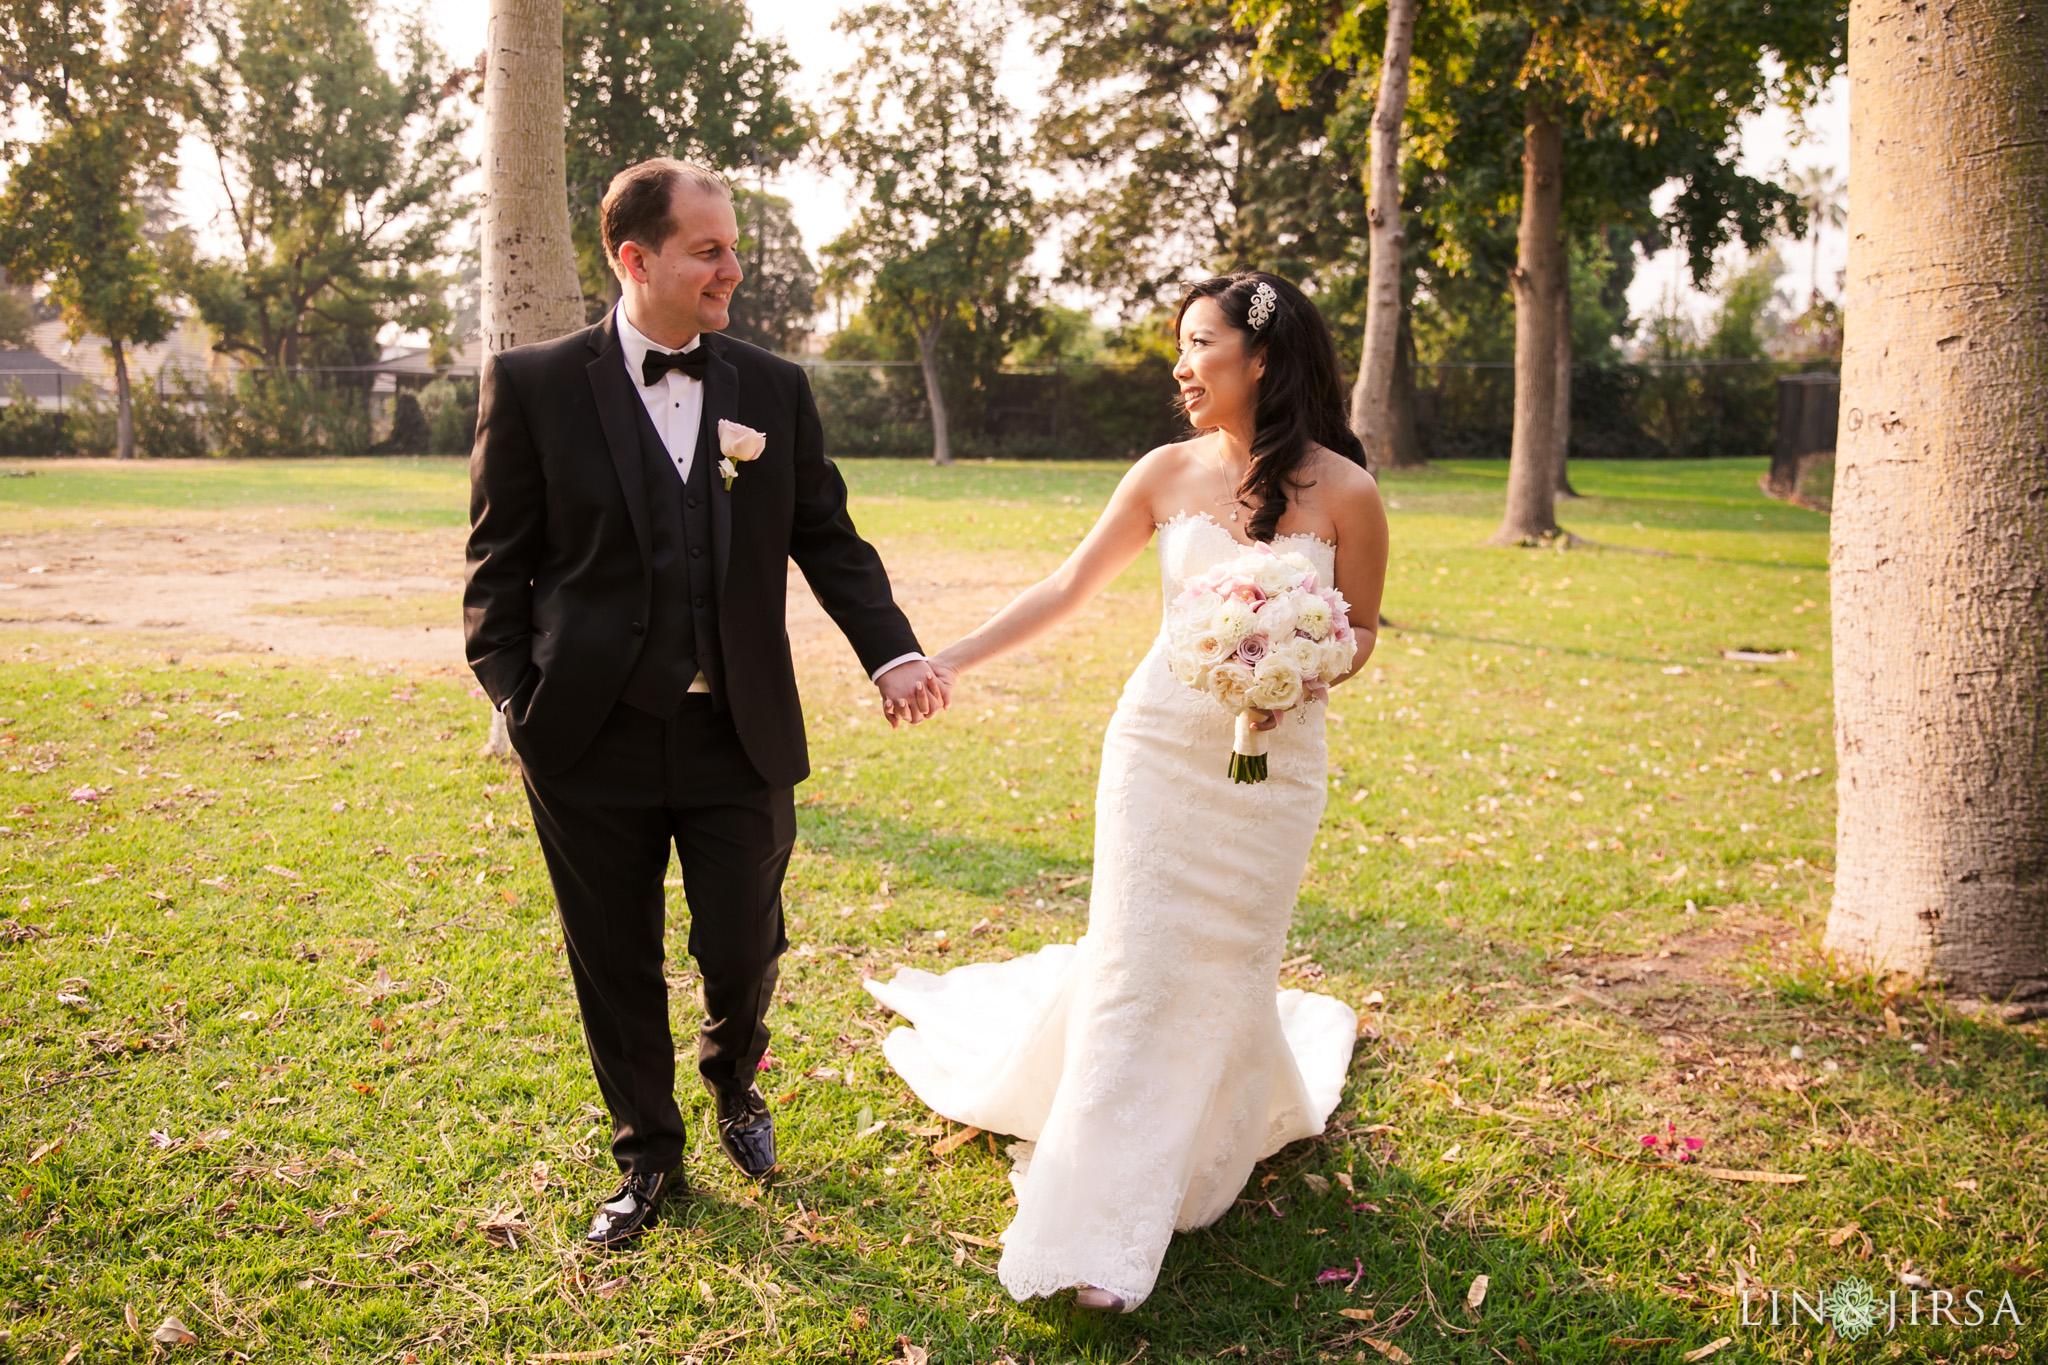 16 vertigo banquet hall glendale wedding photography